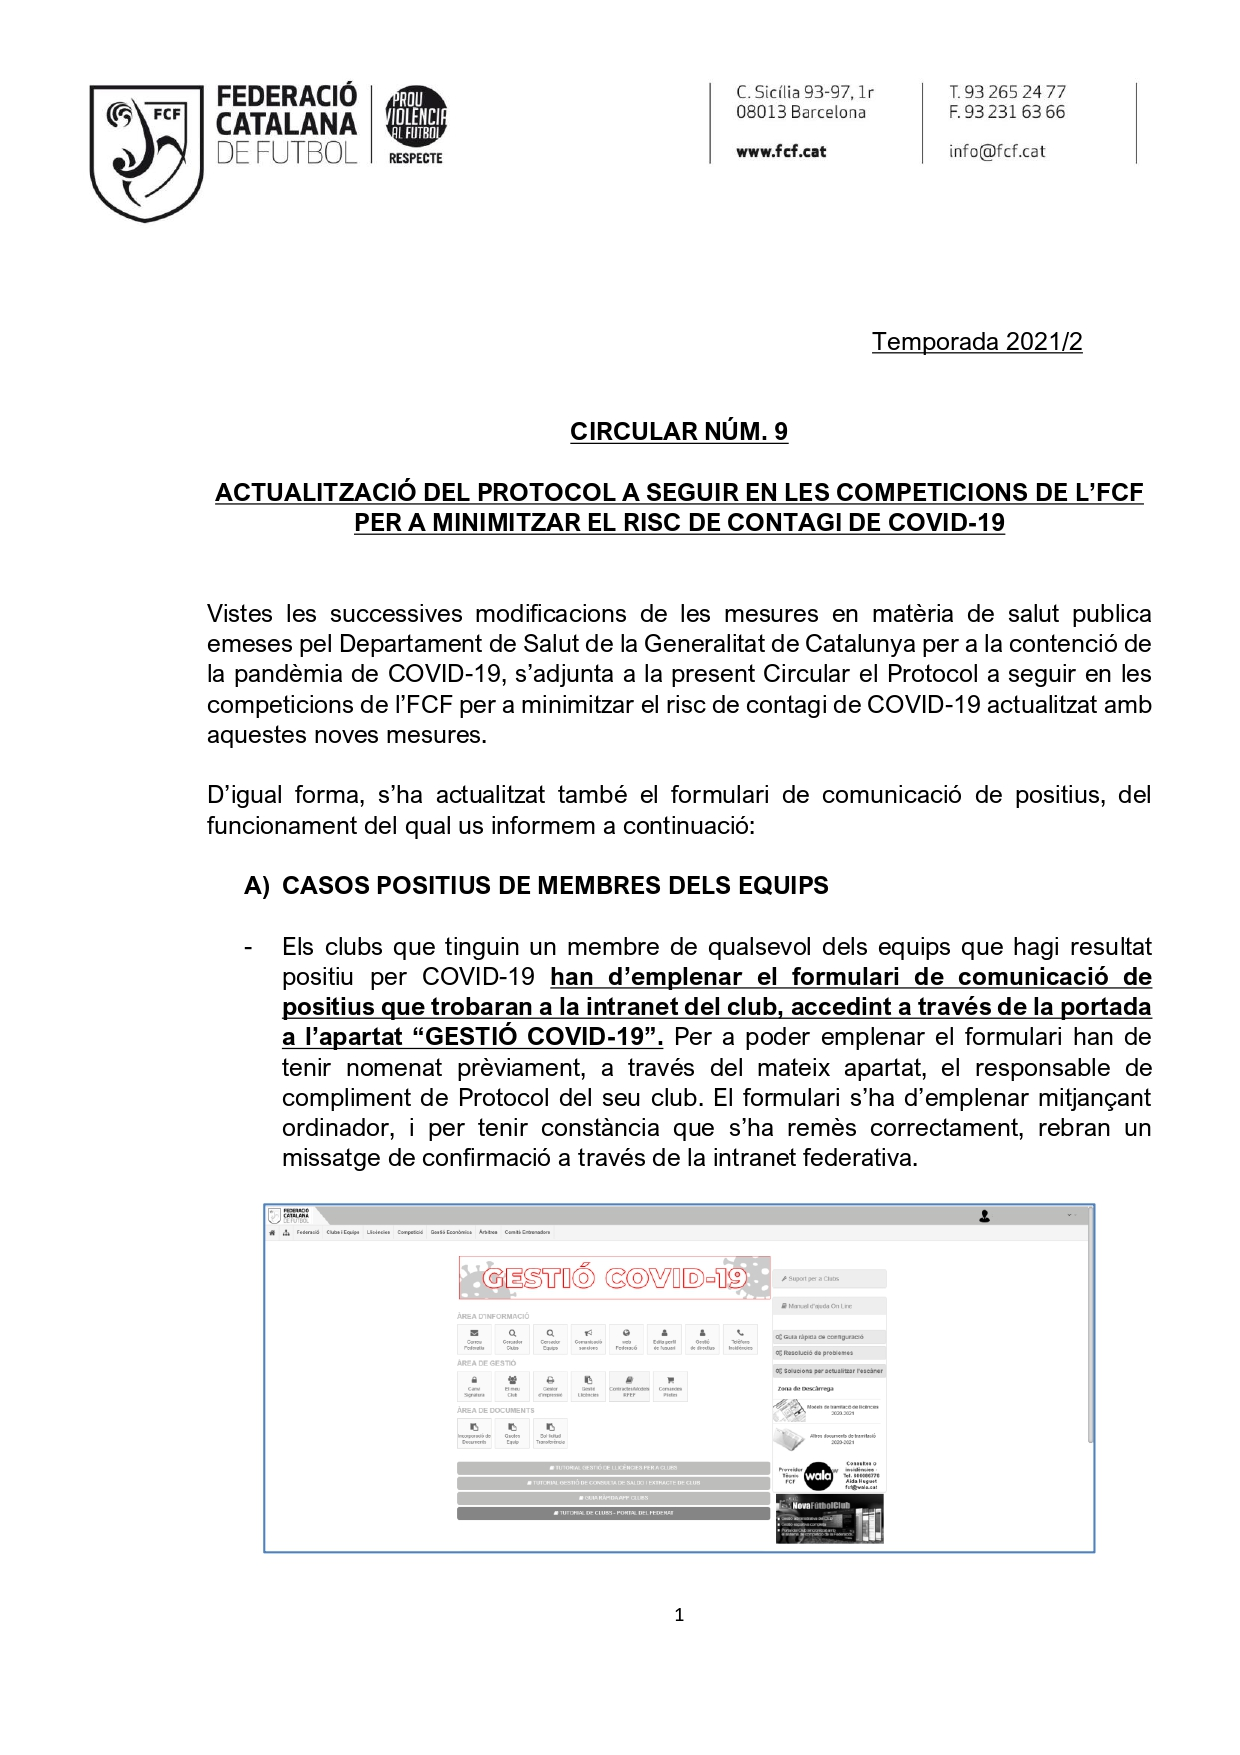 Circular Actualització Protocol Competicions _set21_2_page-0001